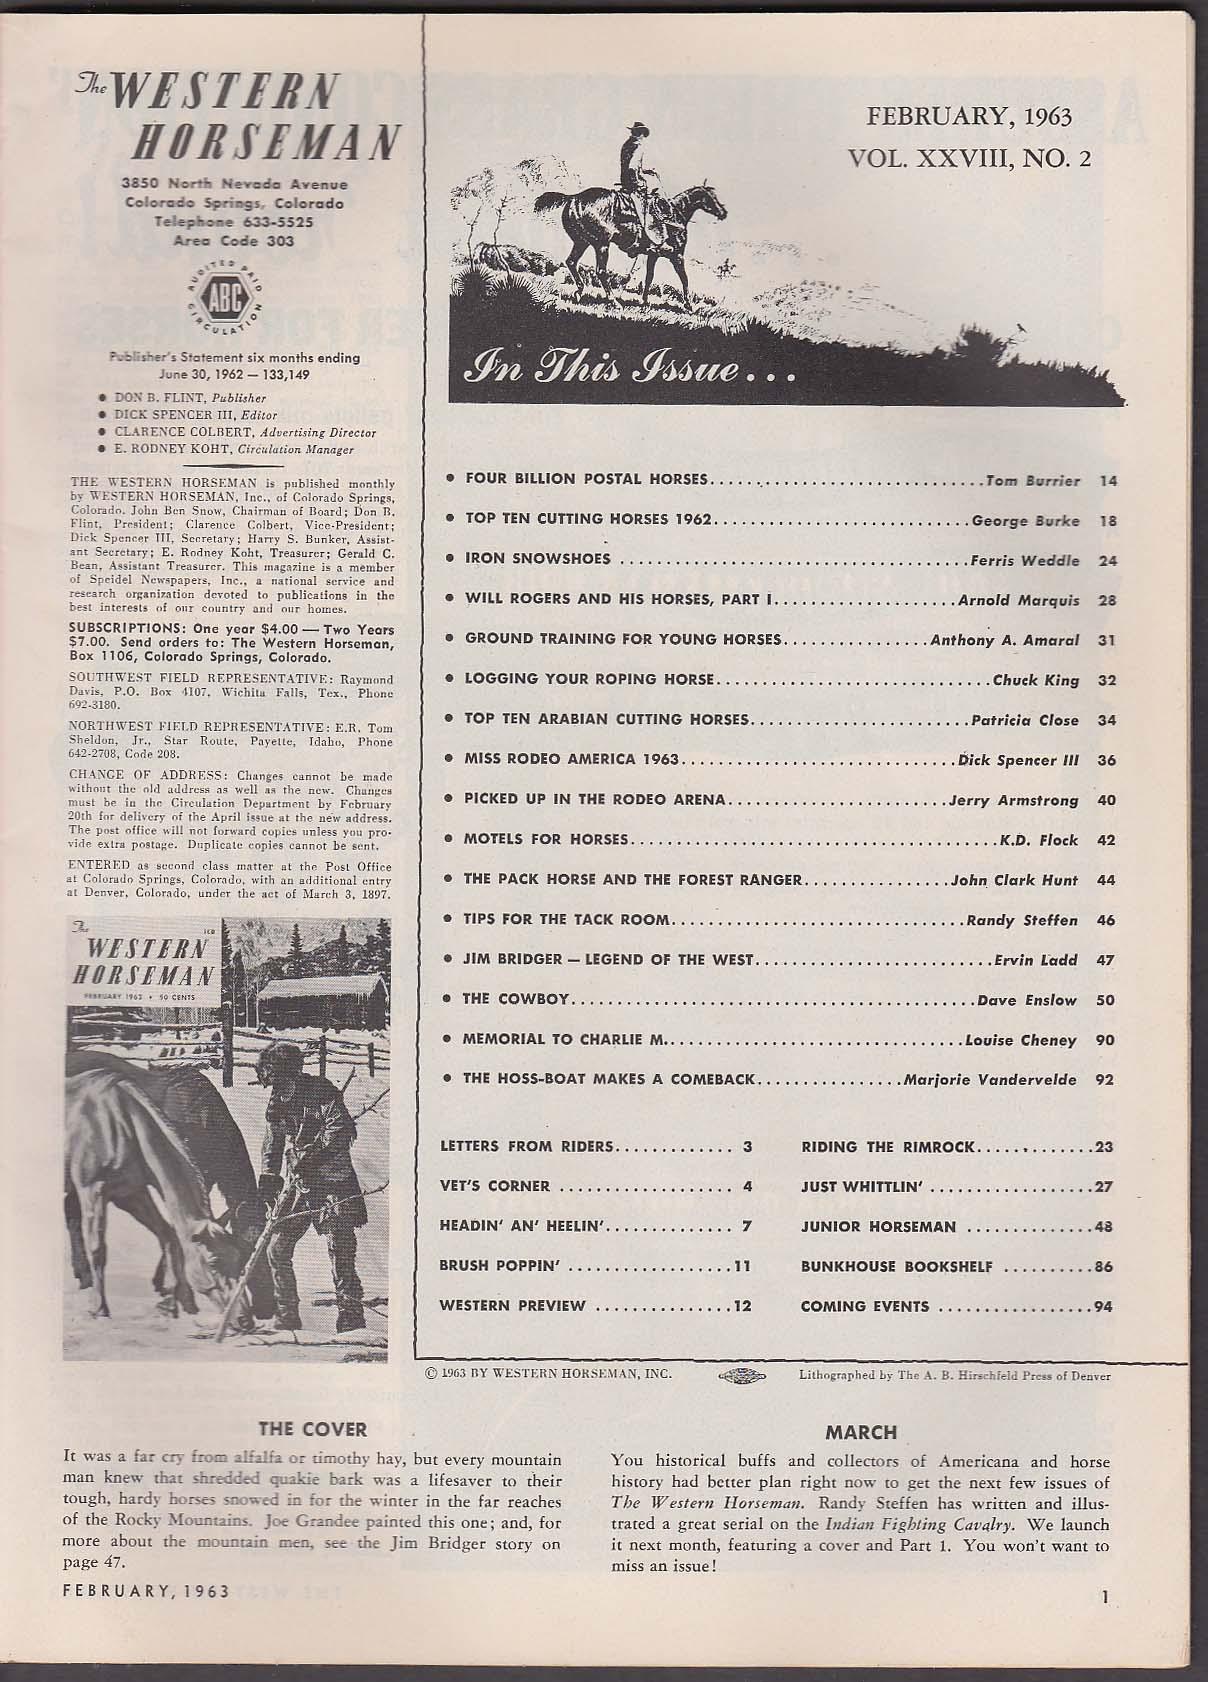 Image for WESTERN HORSEMAN Postal Horses Iron Snowshoes Will Rogers Jim Bridger + 2 1963